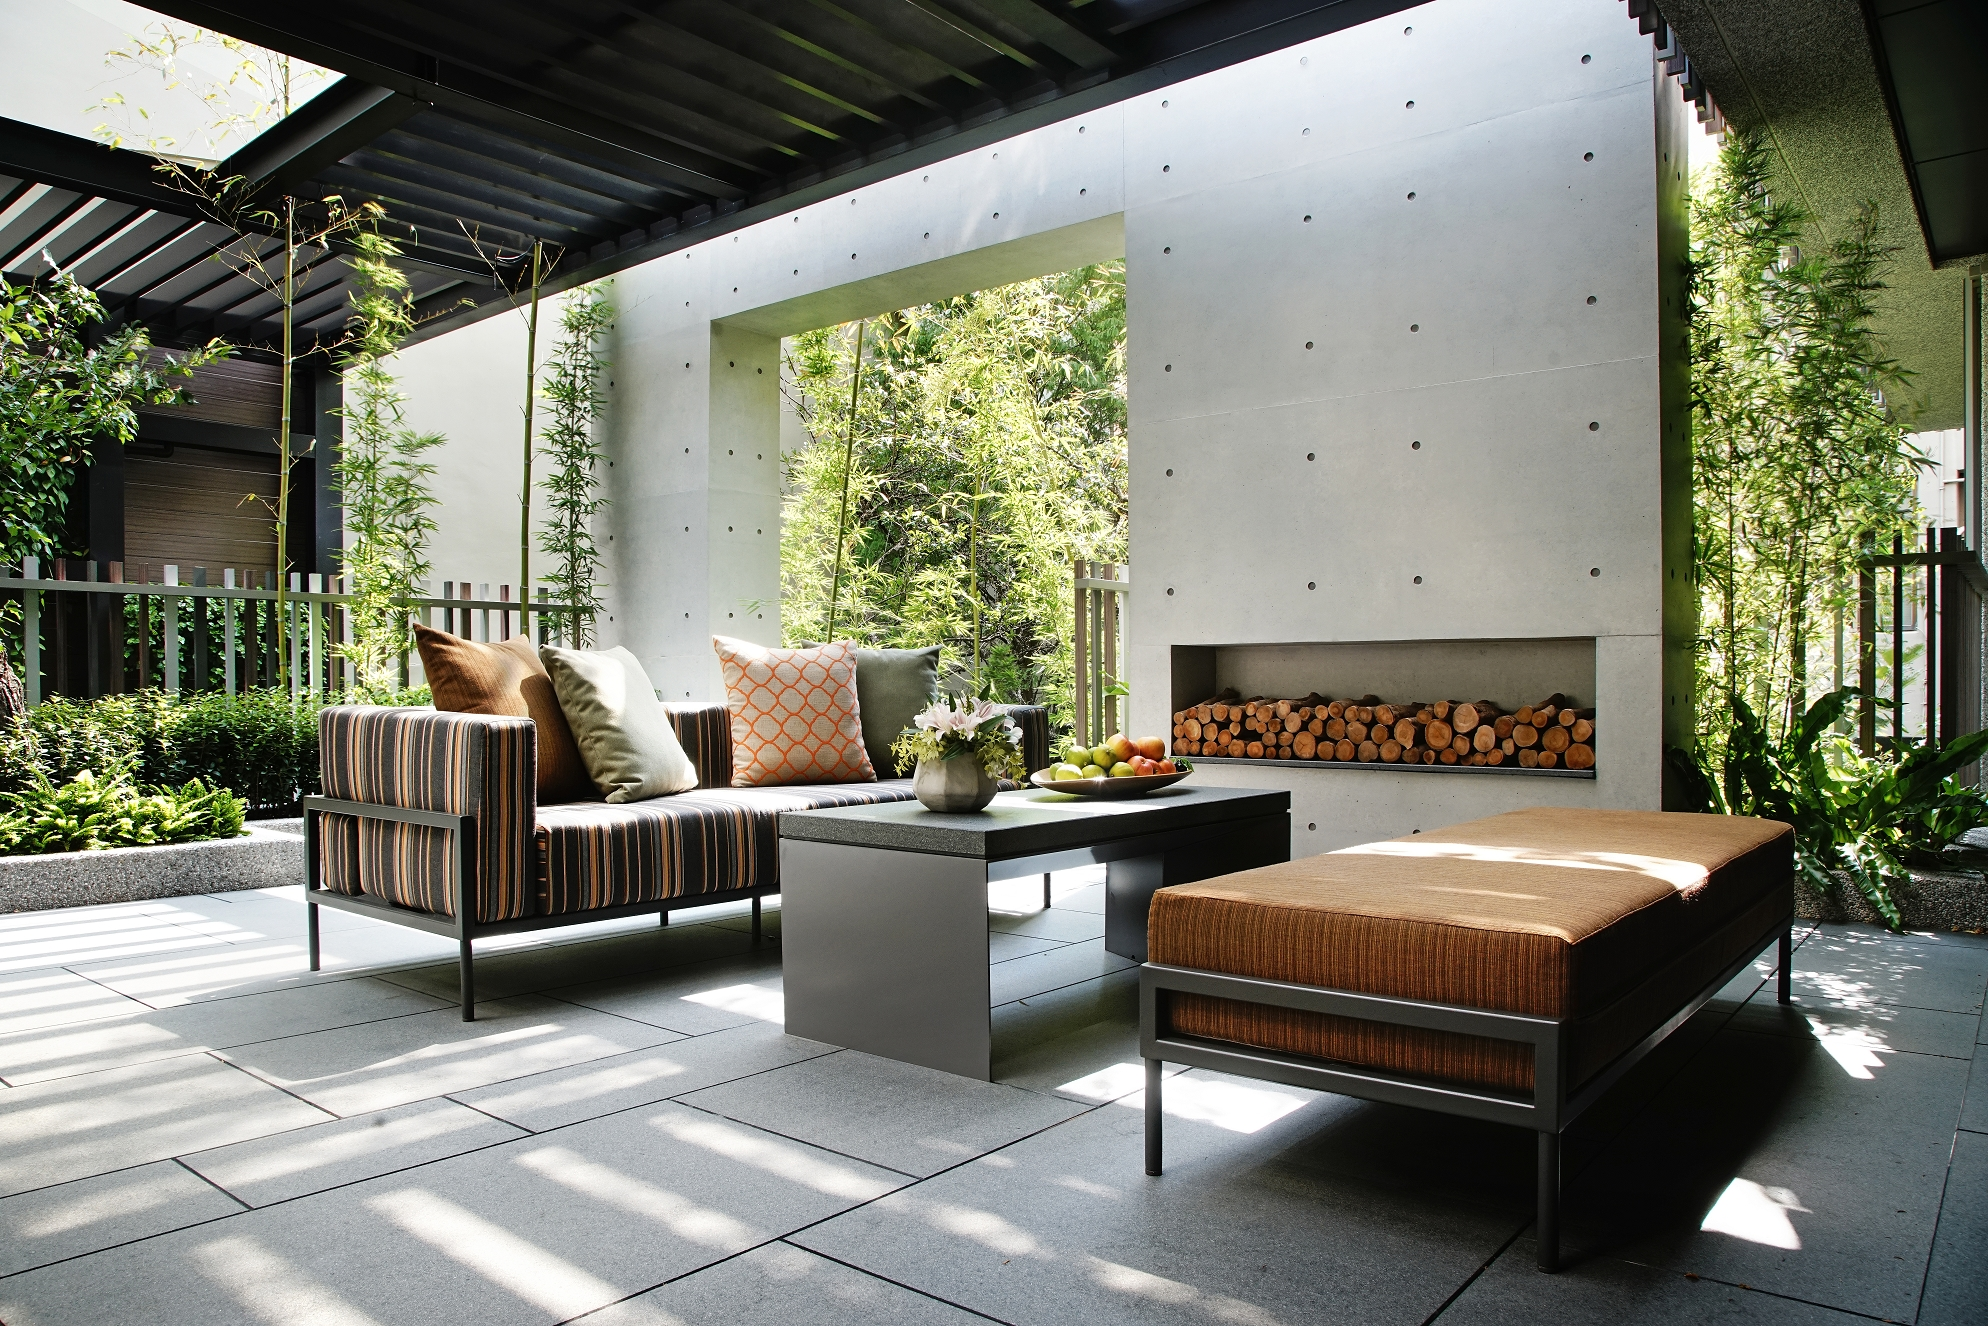 morїden casa-崇尚自然 堅毅不失溫柔的 戶外家具品牌